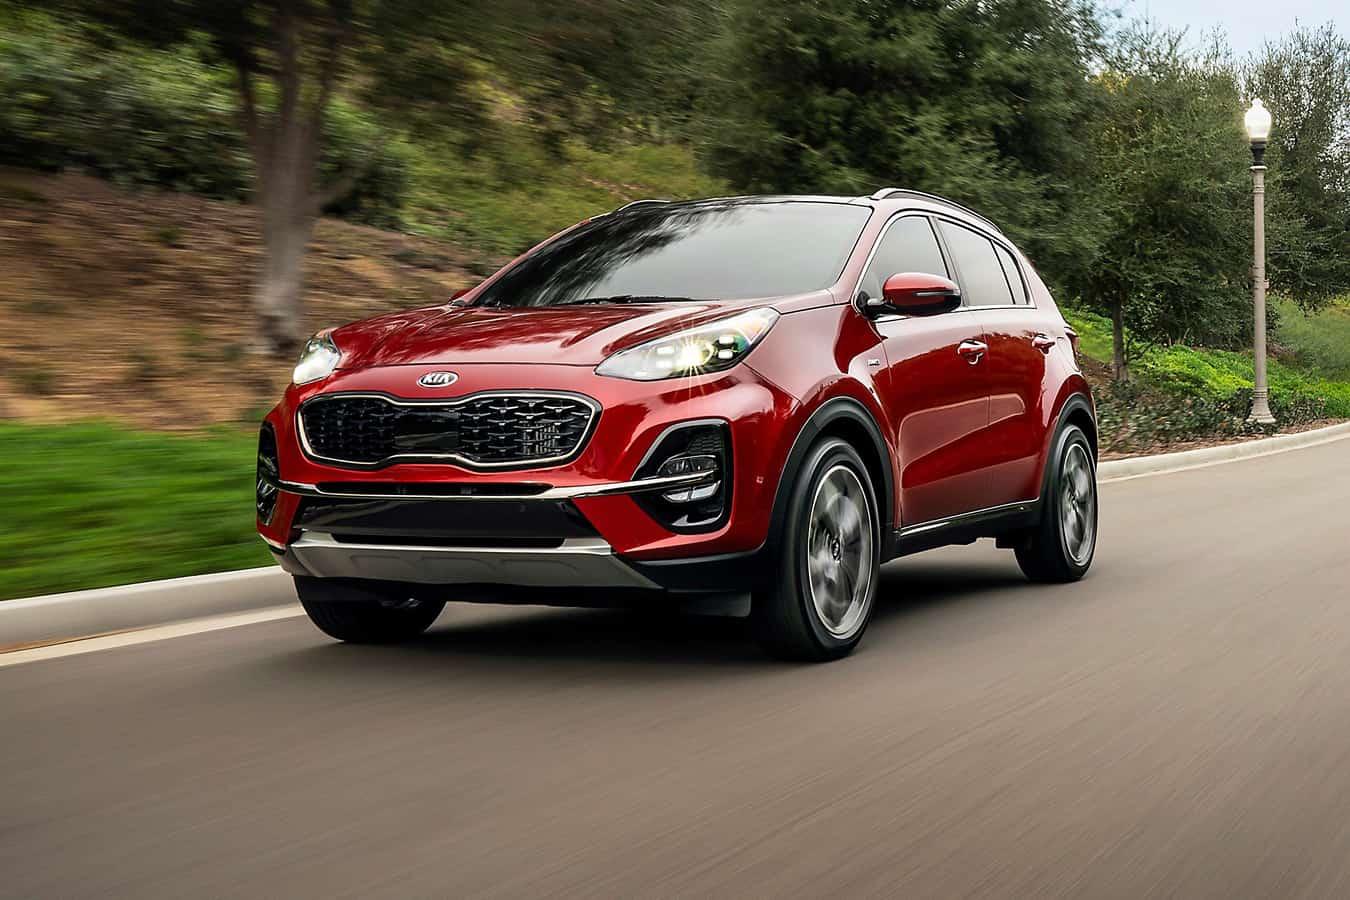 Purchase a SUV Online 2020 Kia Sportage Near Longmont CO